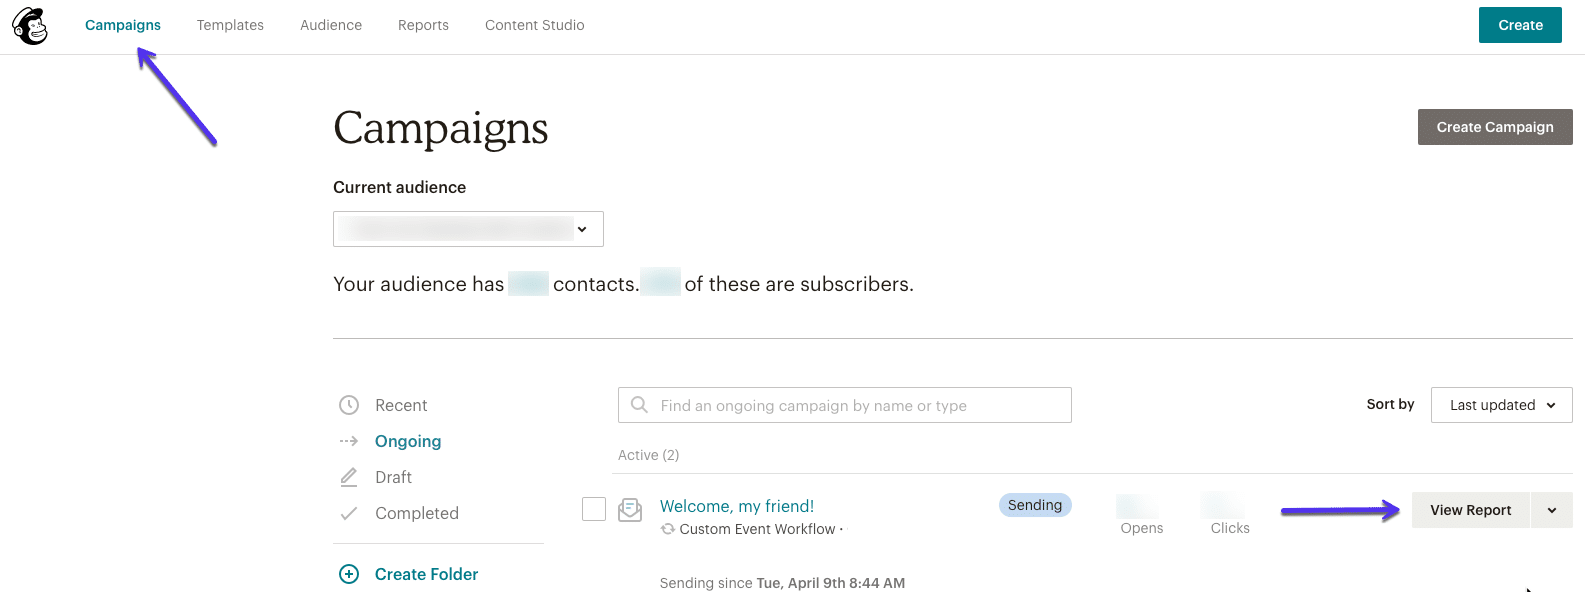 Reportes de campaña de email automatizada